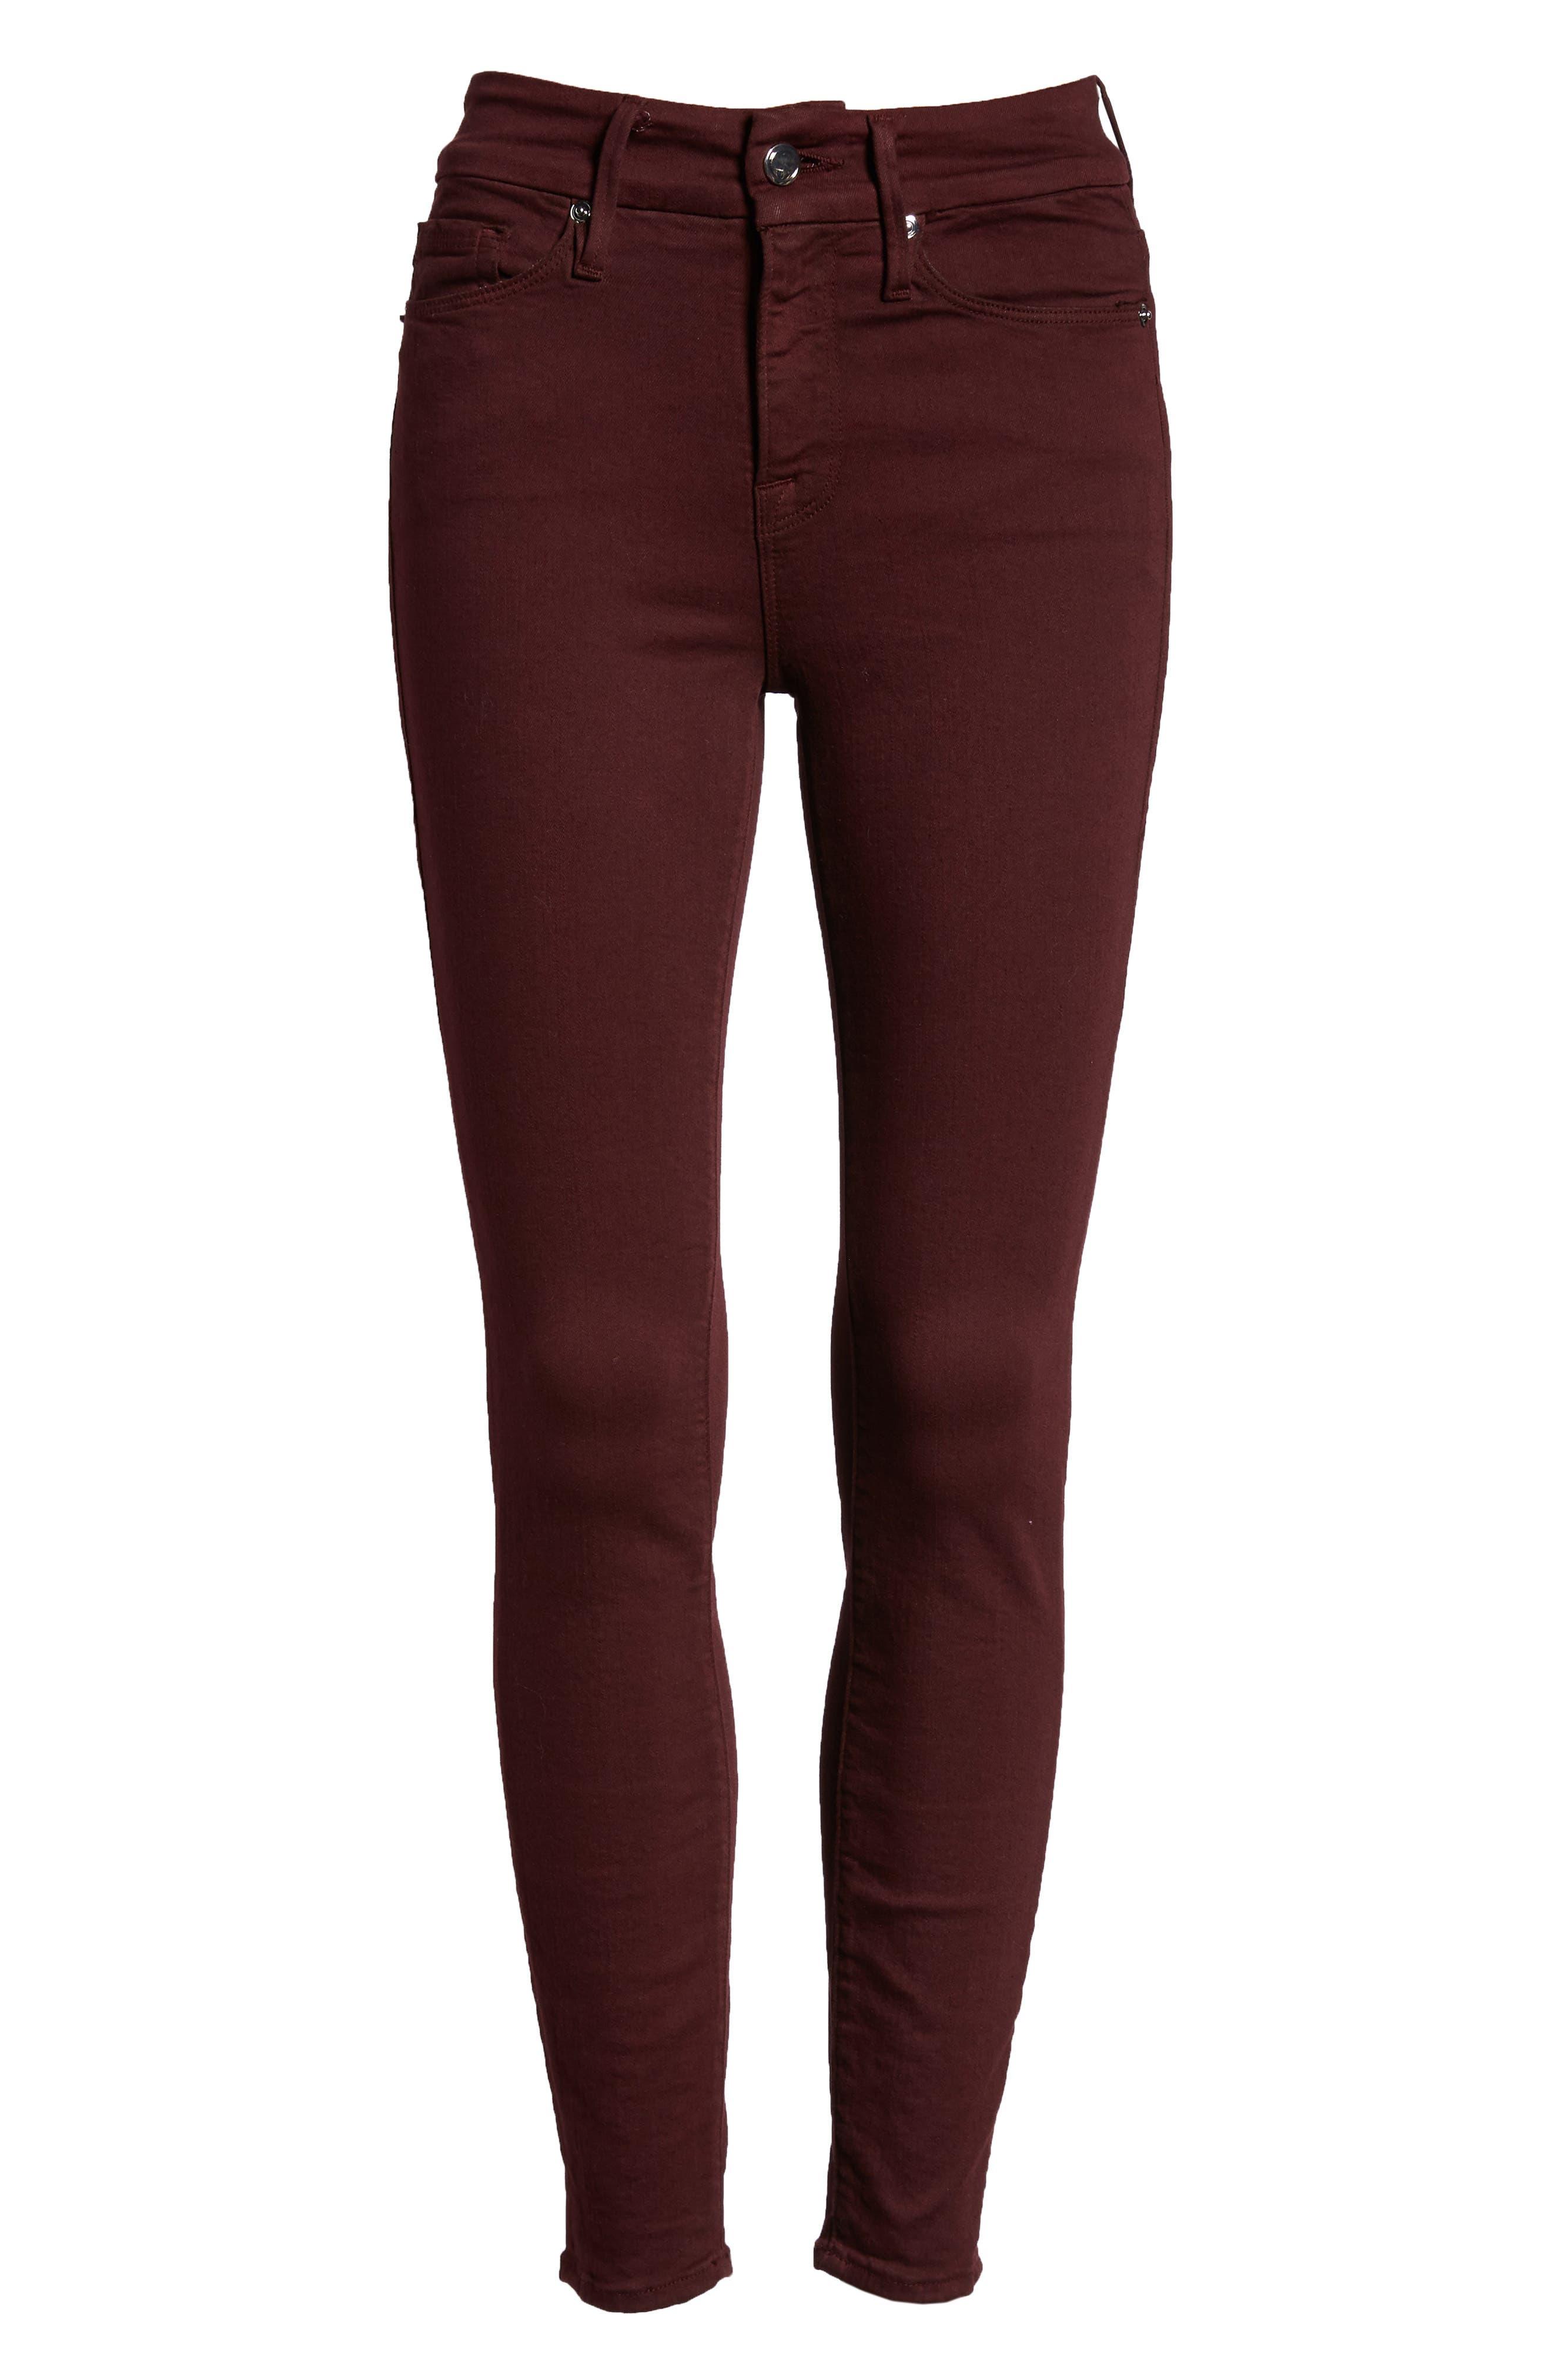 Good Legs High Waist Ankle Skinny Jeans,                             Alternate thumbnail 8, color,                             BURGUNDY 001